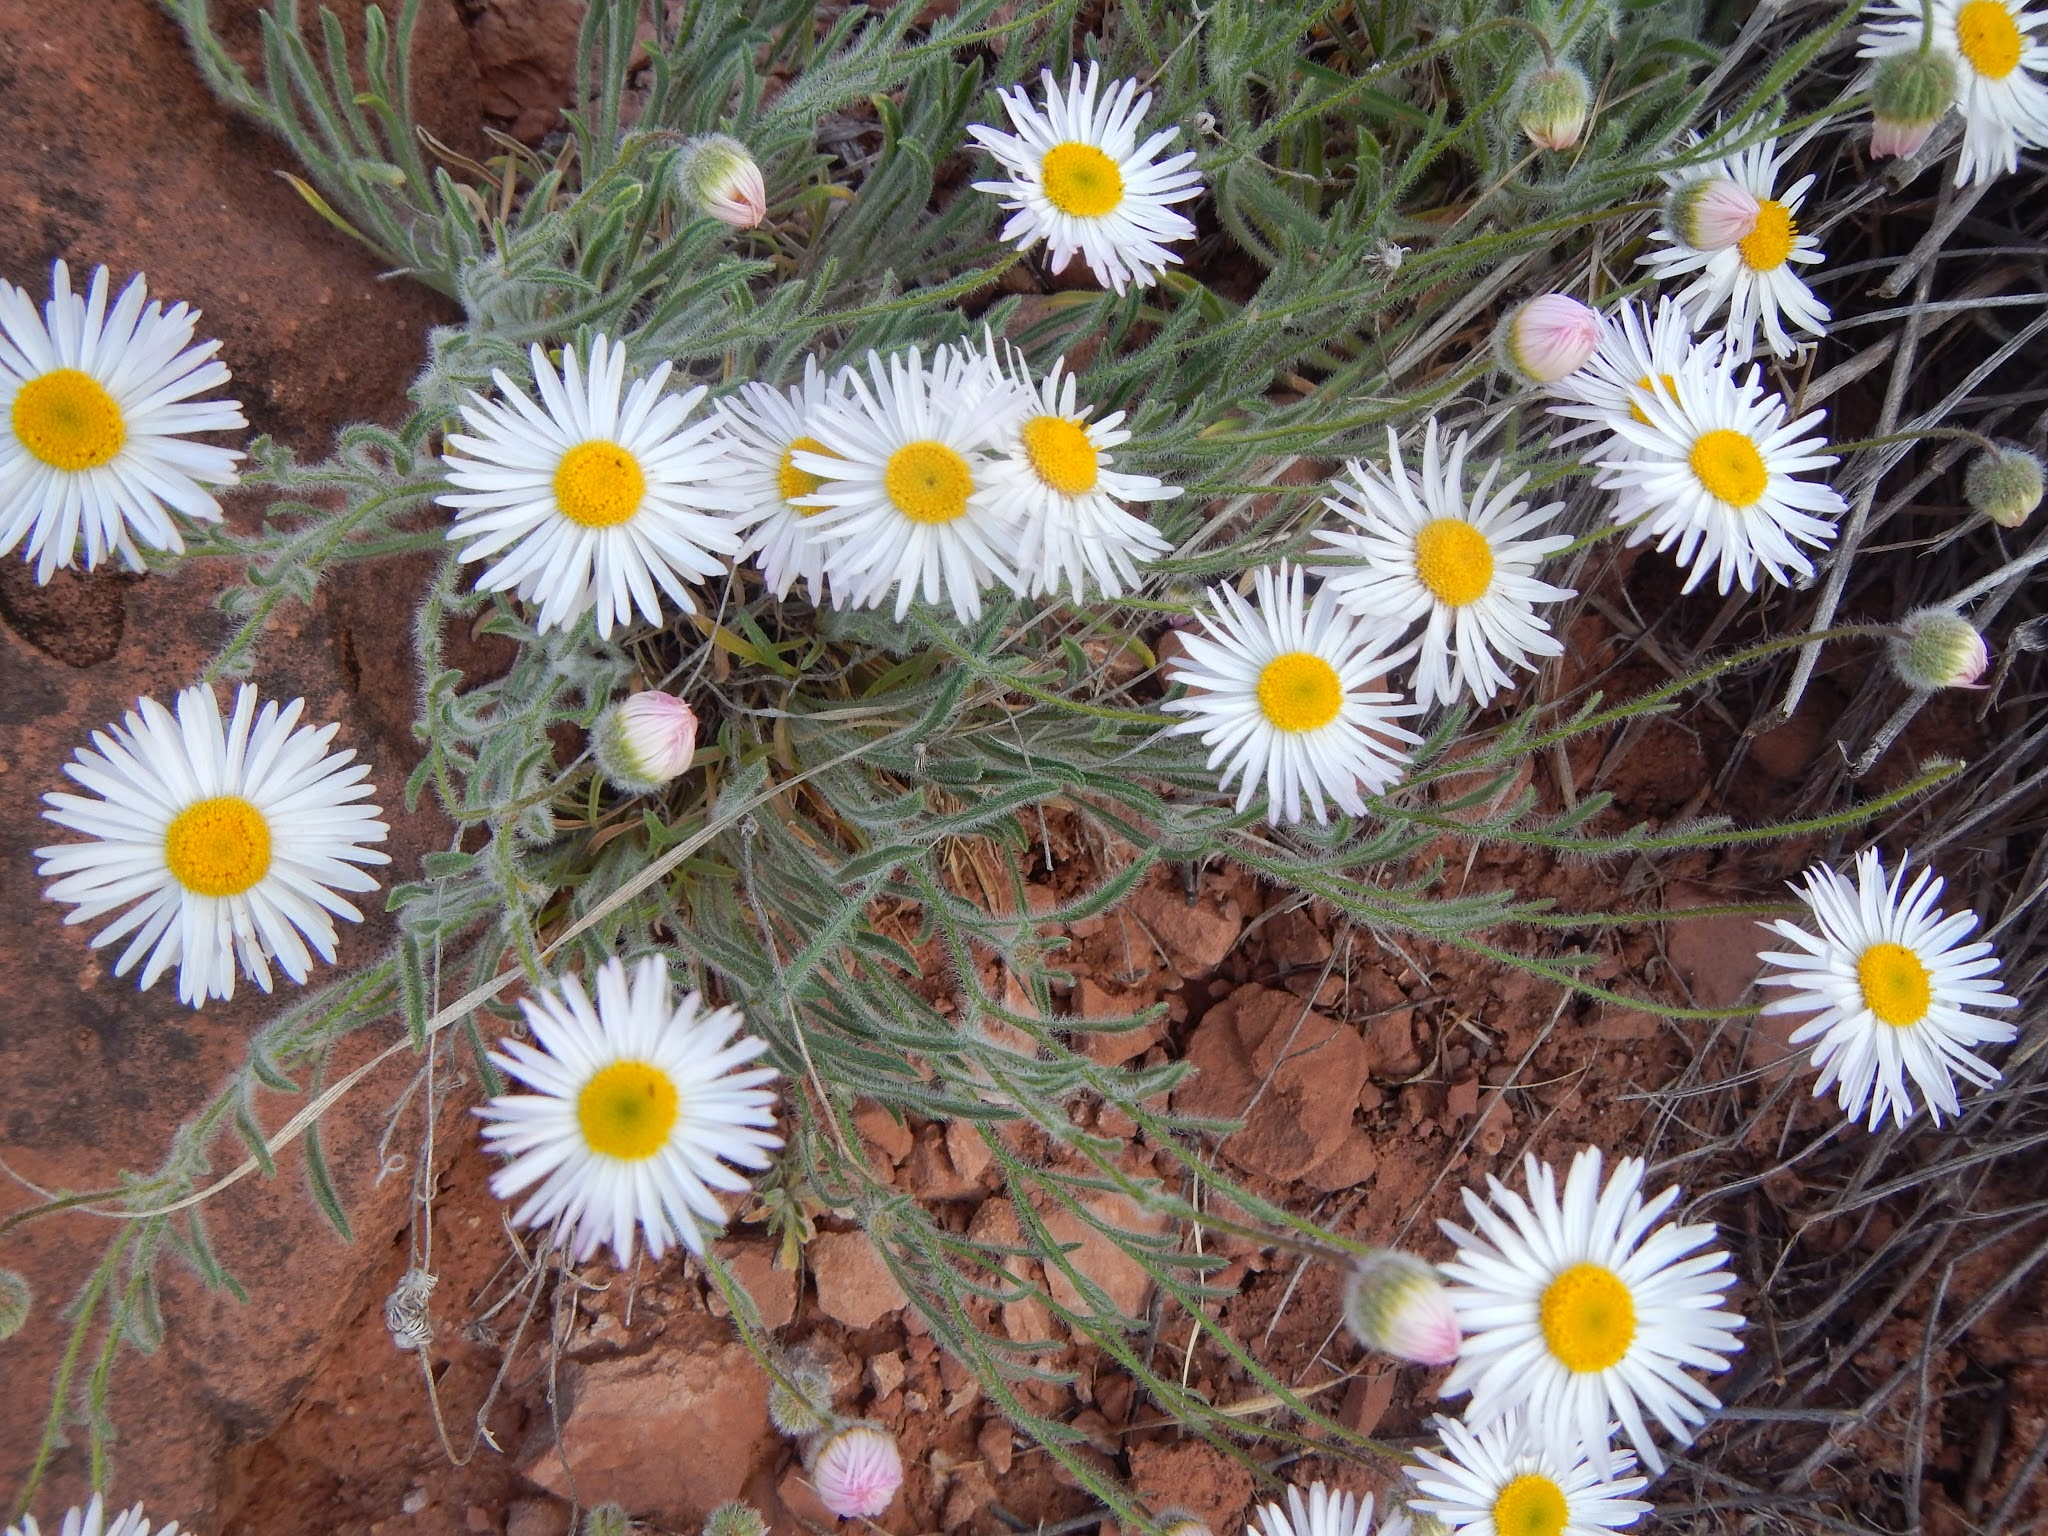 Photo: Daisies in the desert